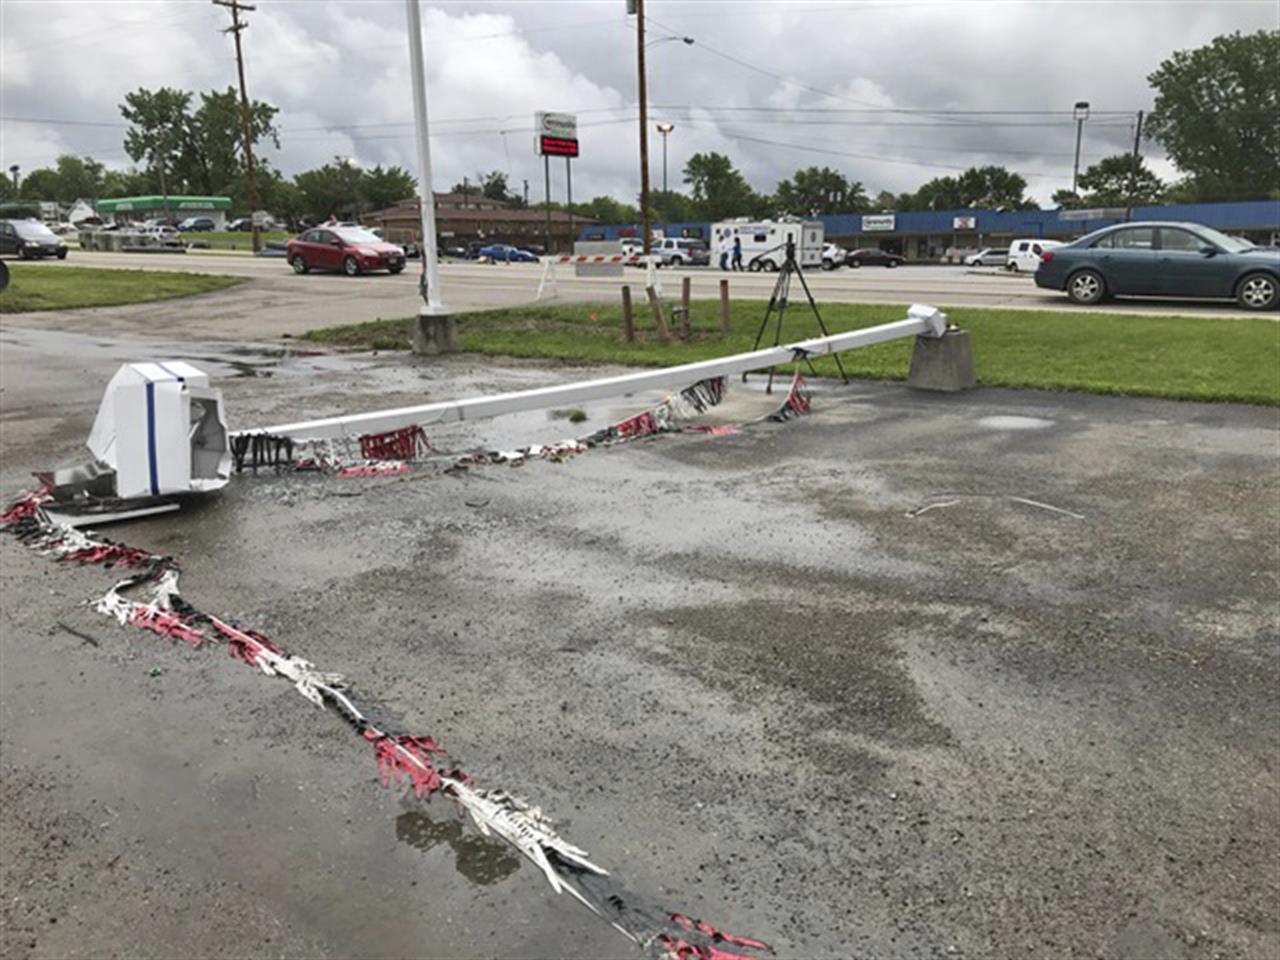 ohio tornadoes damage businesses interrupt graduation